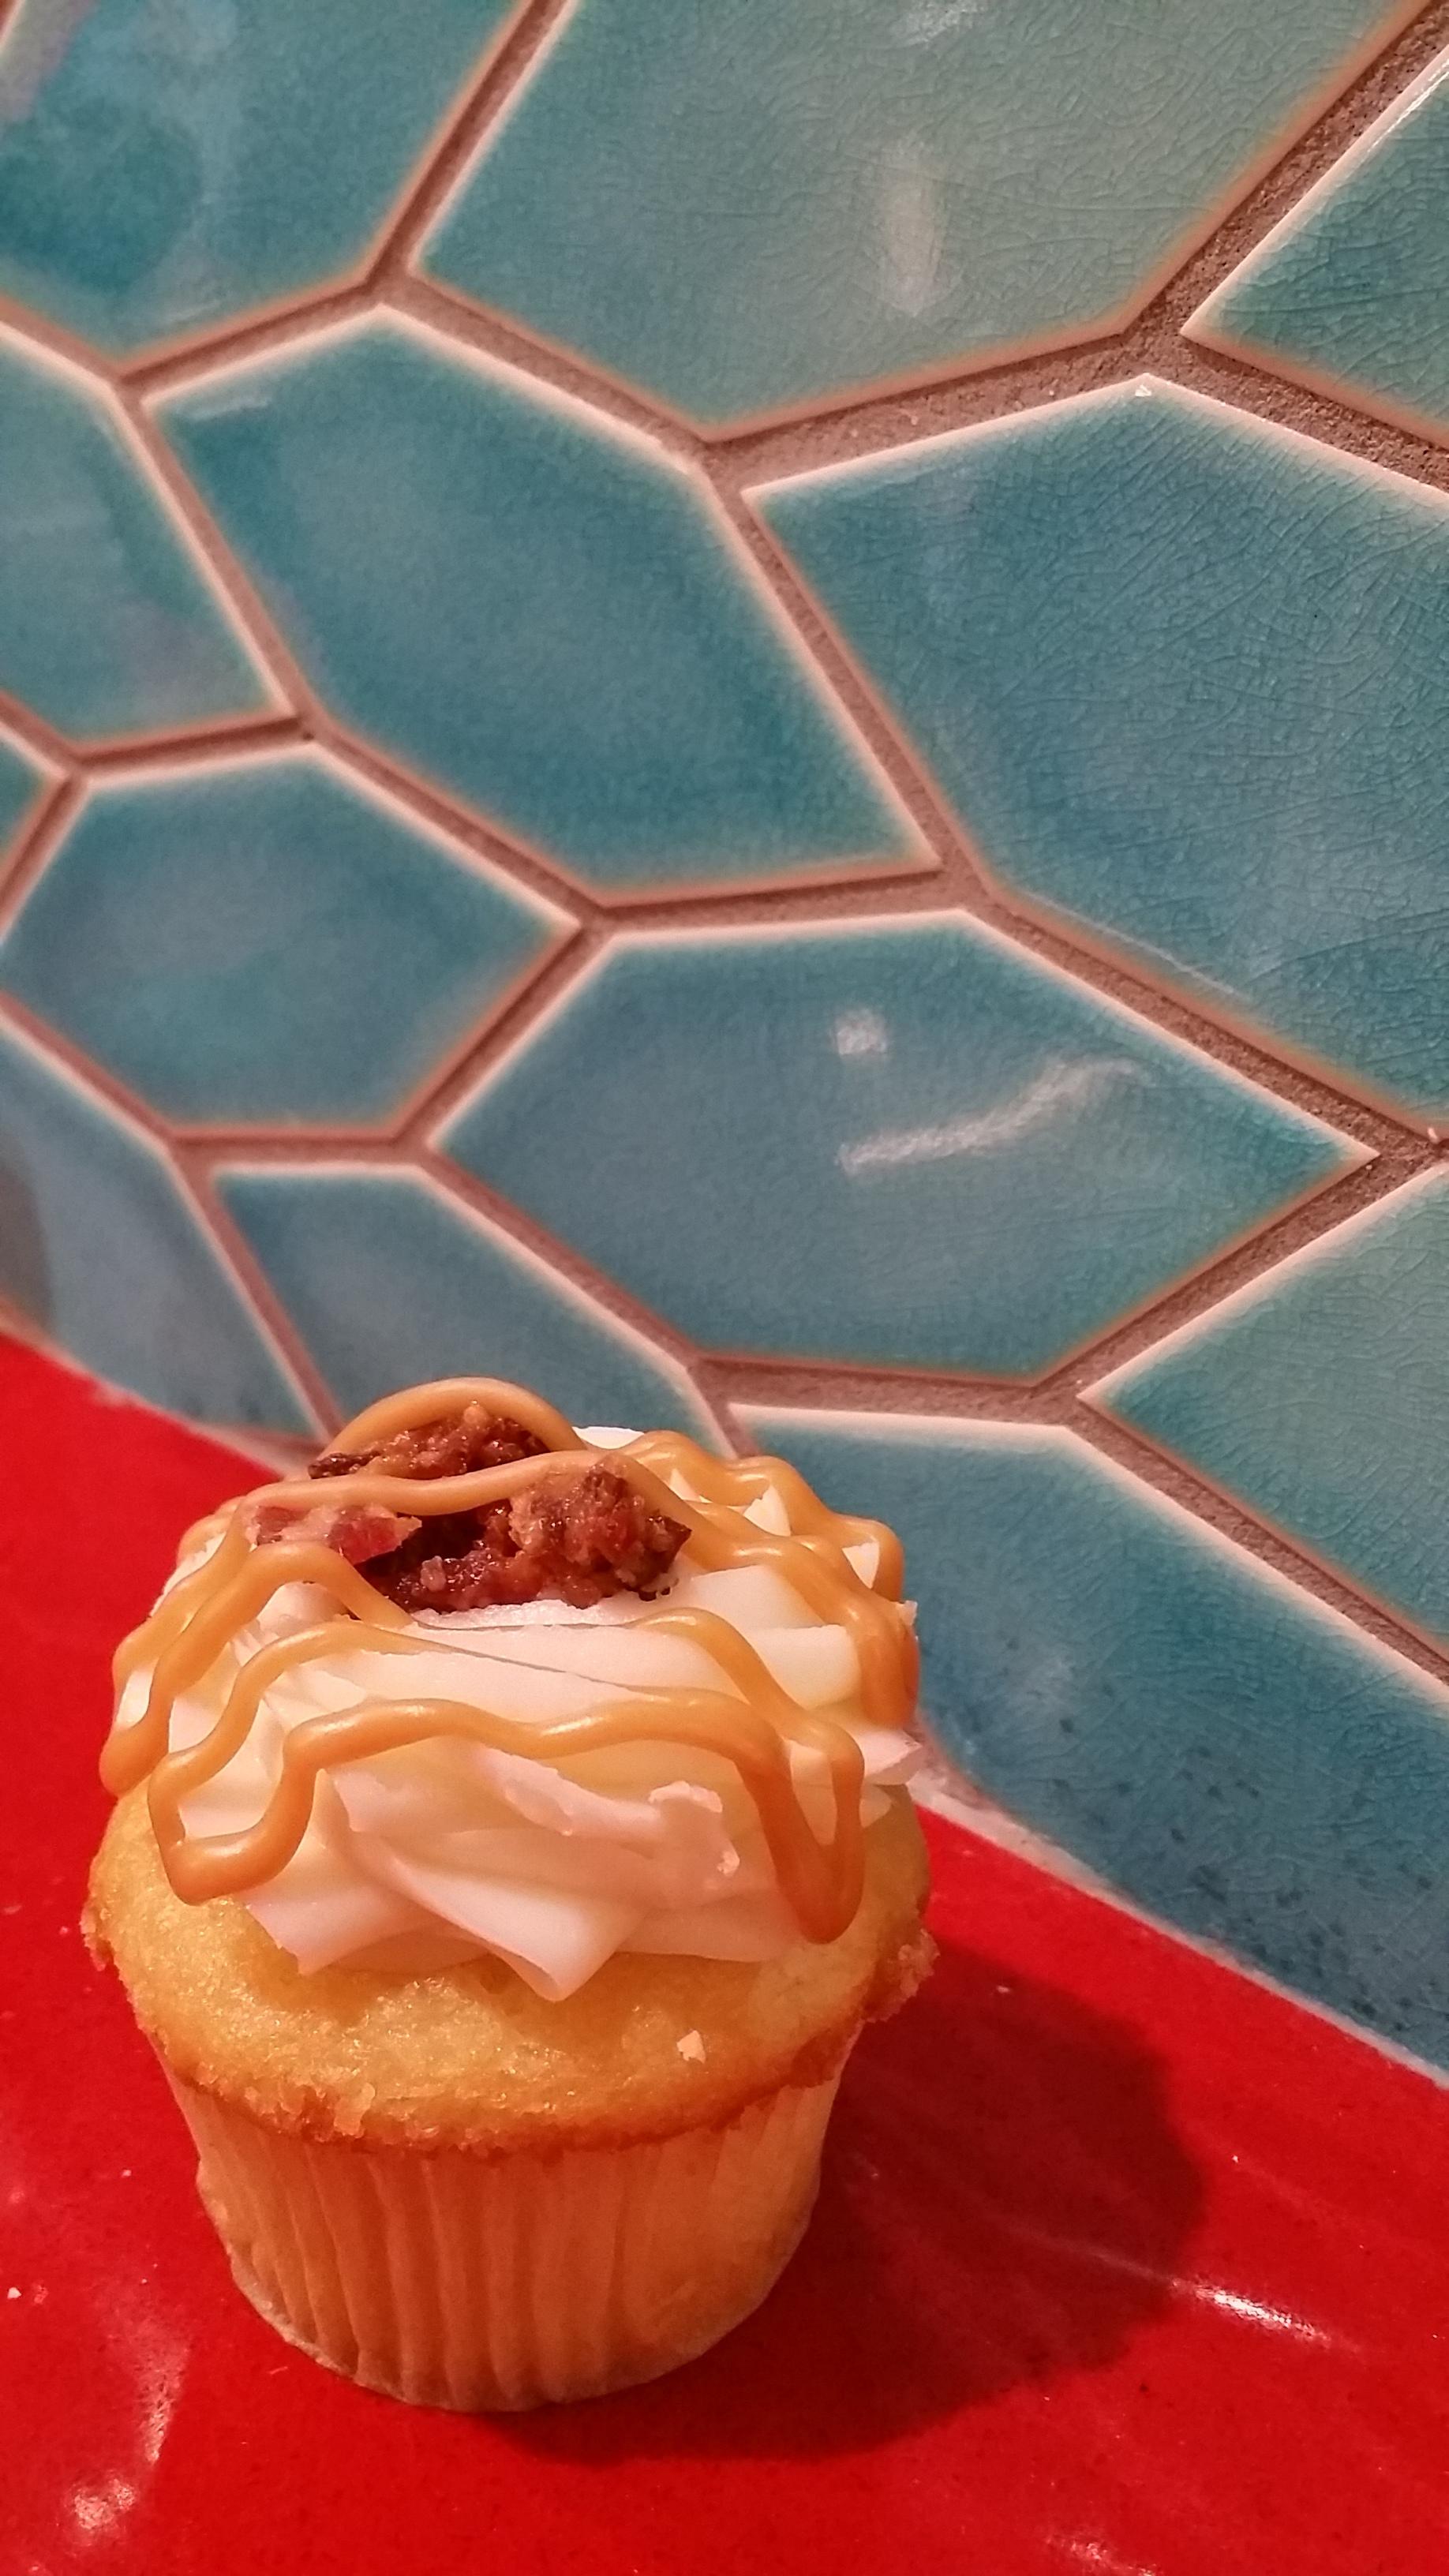 Cako Maple Bacon Cupcake